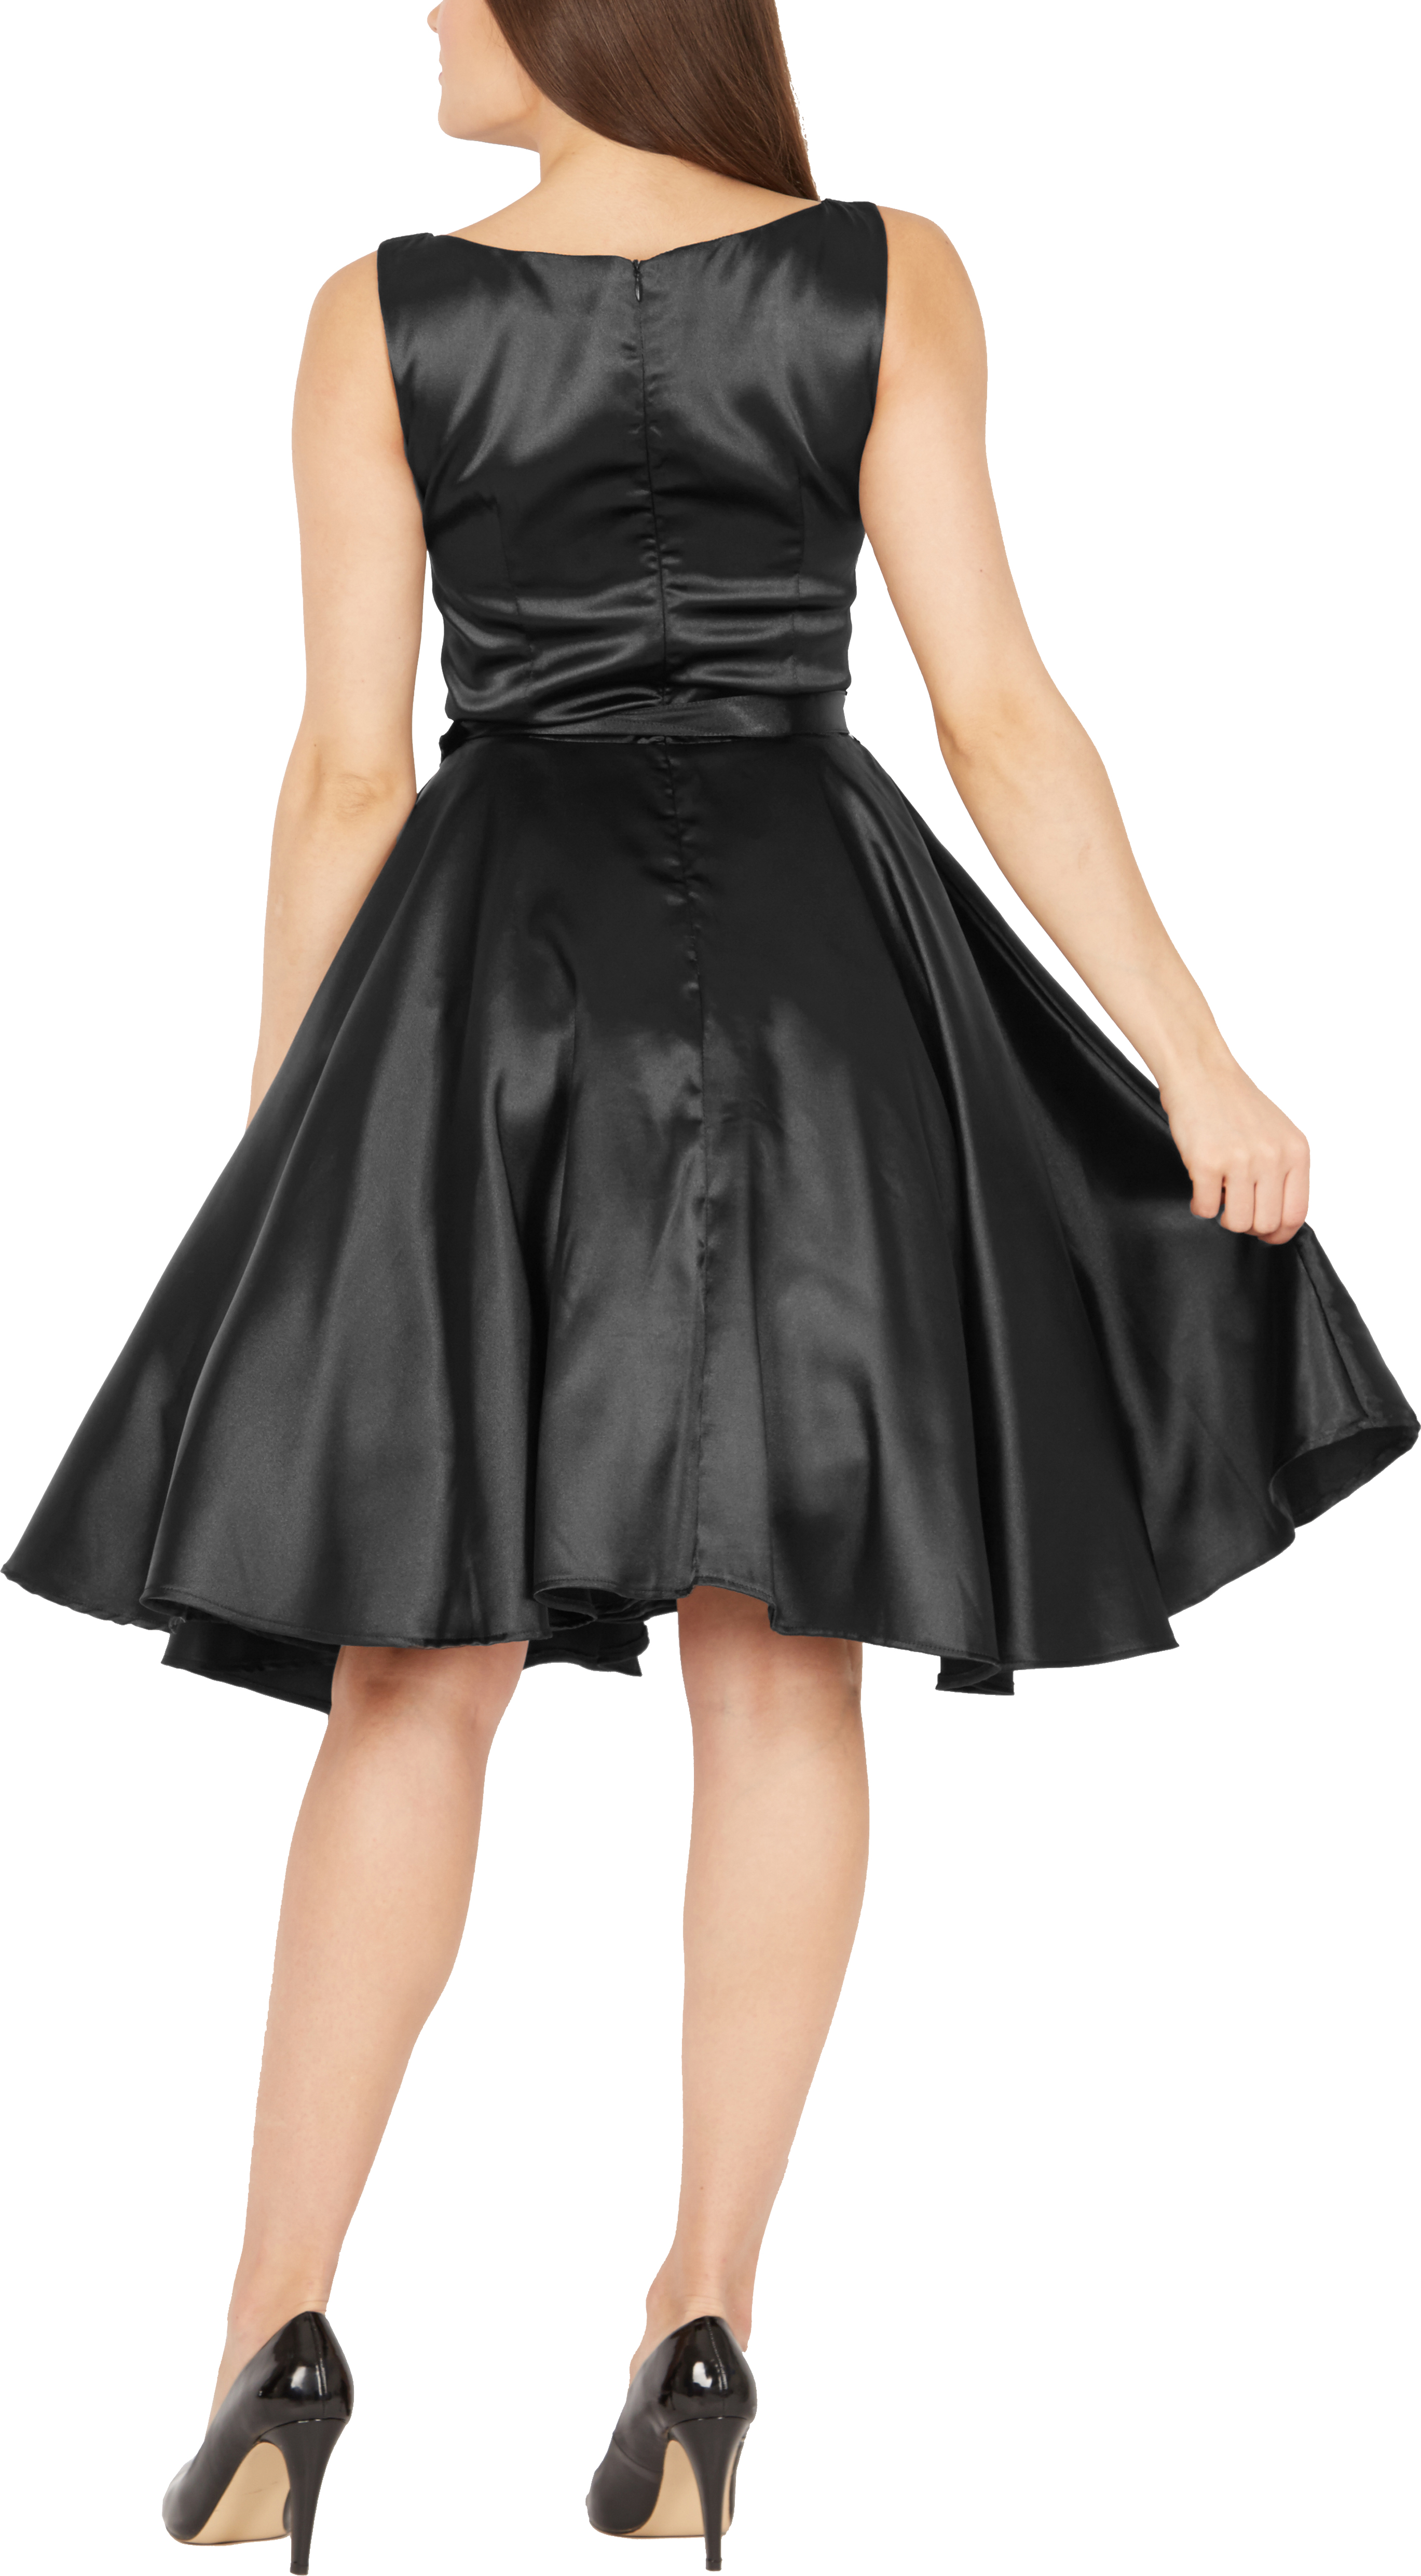 BlackButterfly-Audrey-Vintage-Satin-Clarity-Vintage-50-039-s-Rockabilly-Swing-Dress thumbnail 6